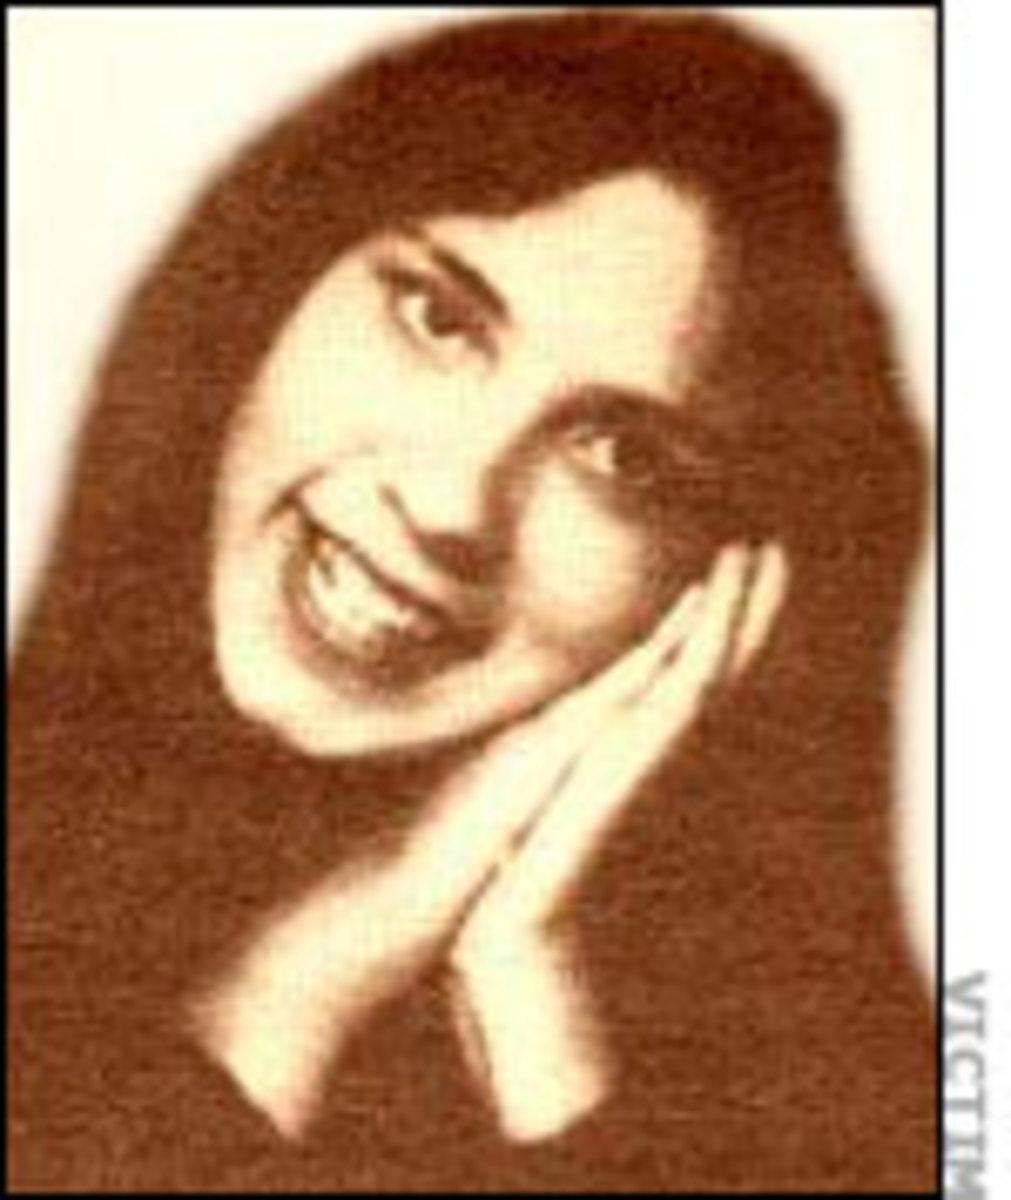 Lisa McVey